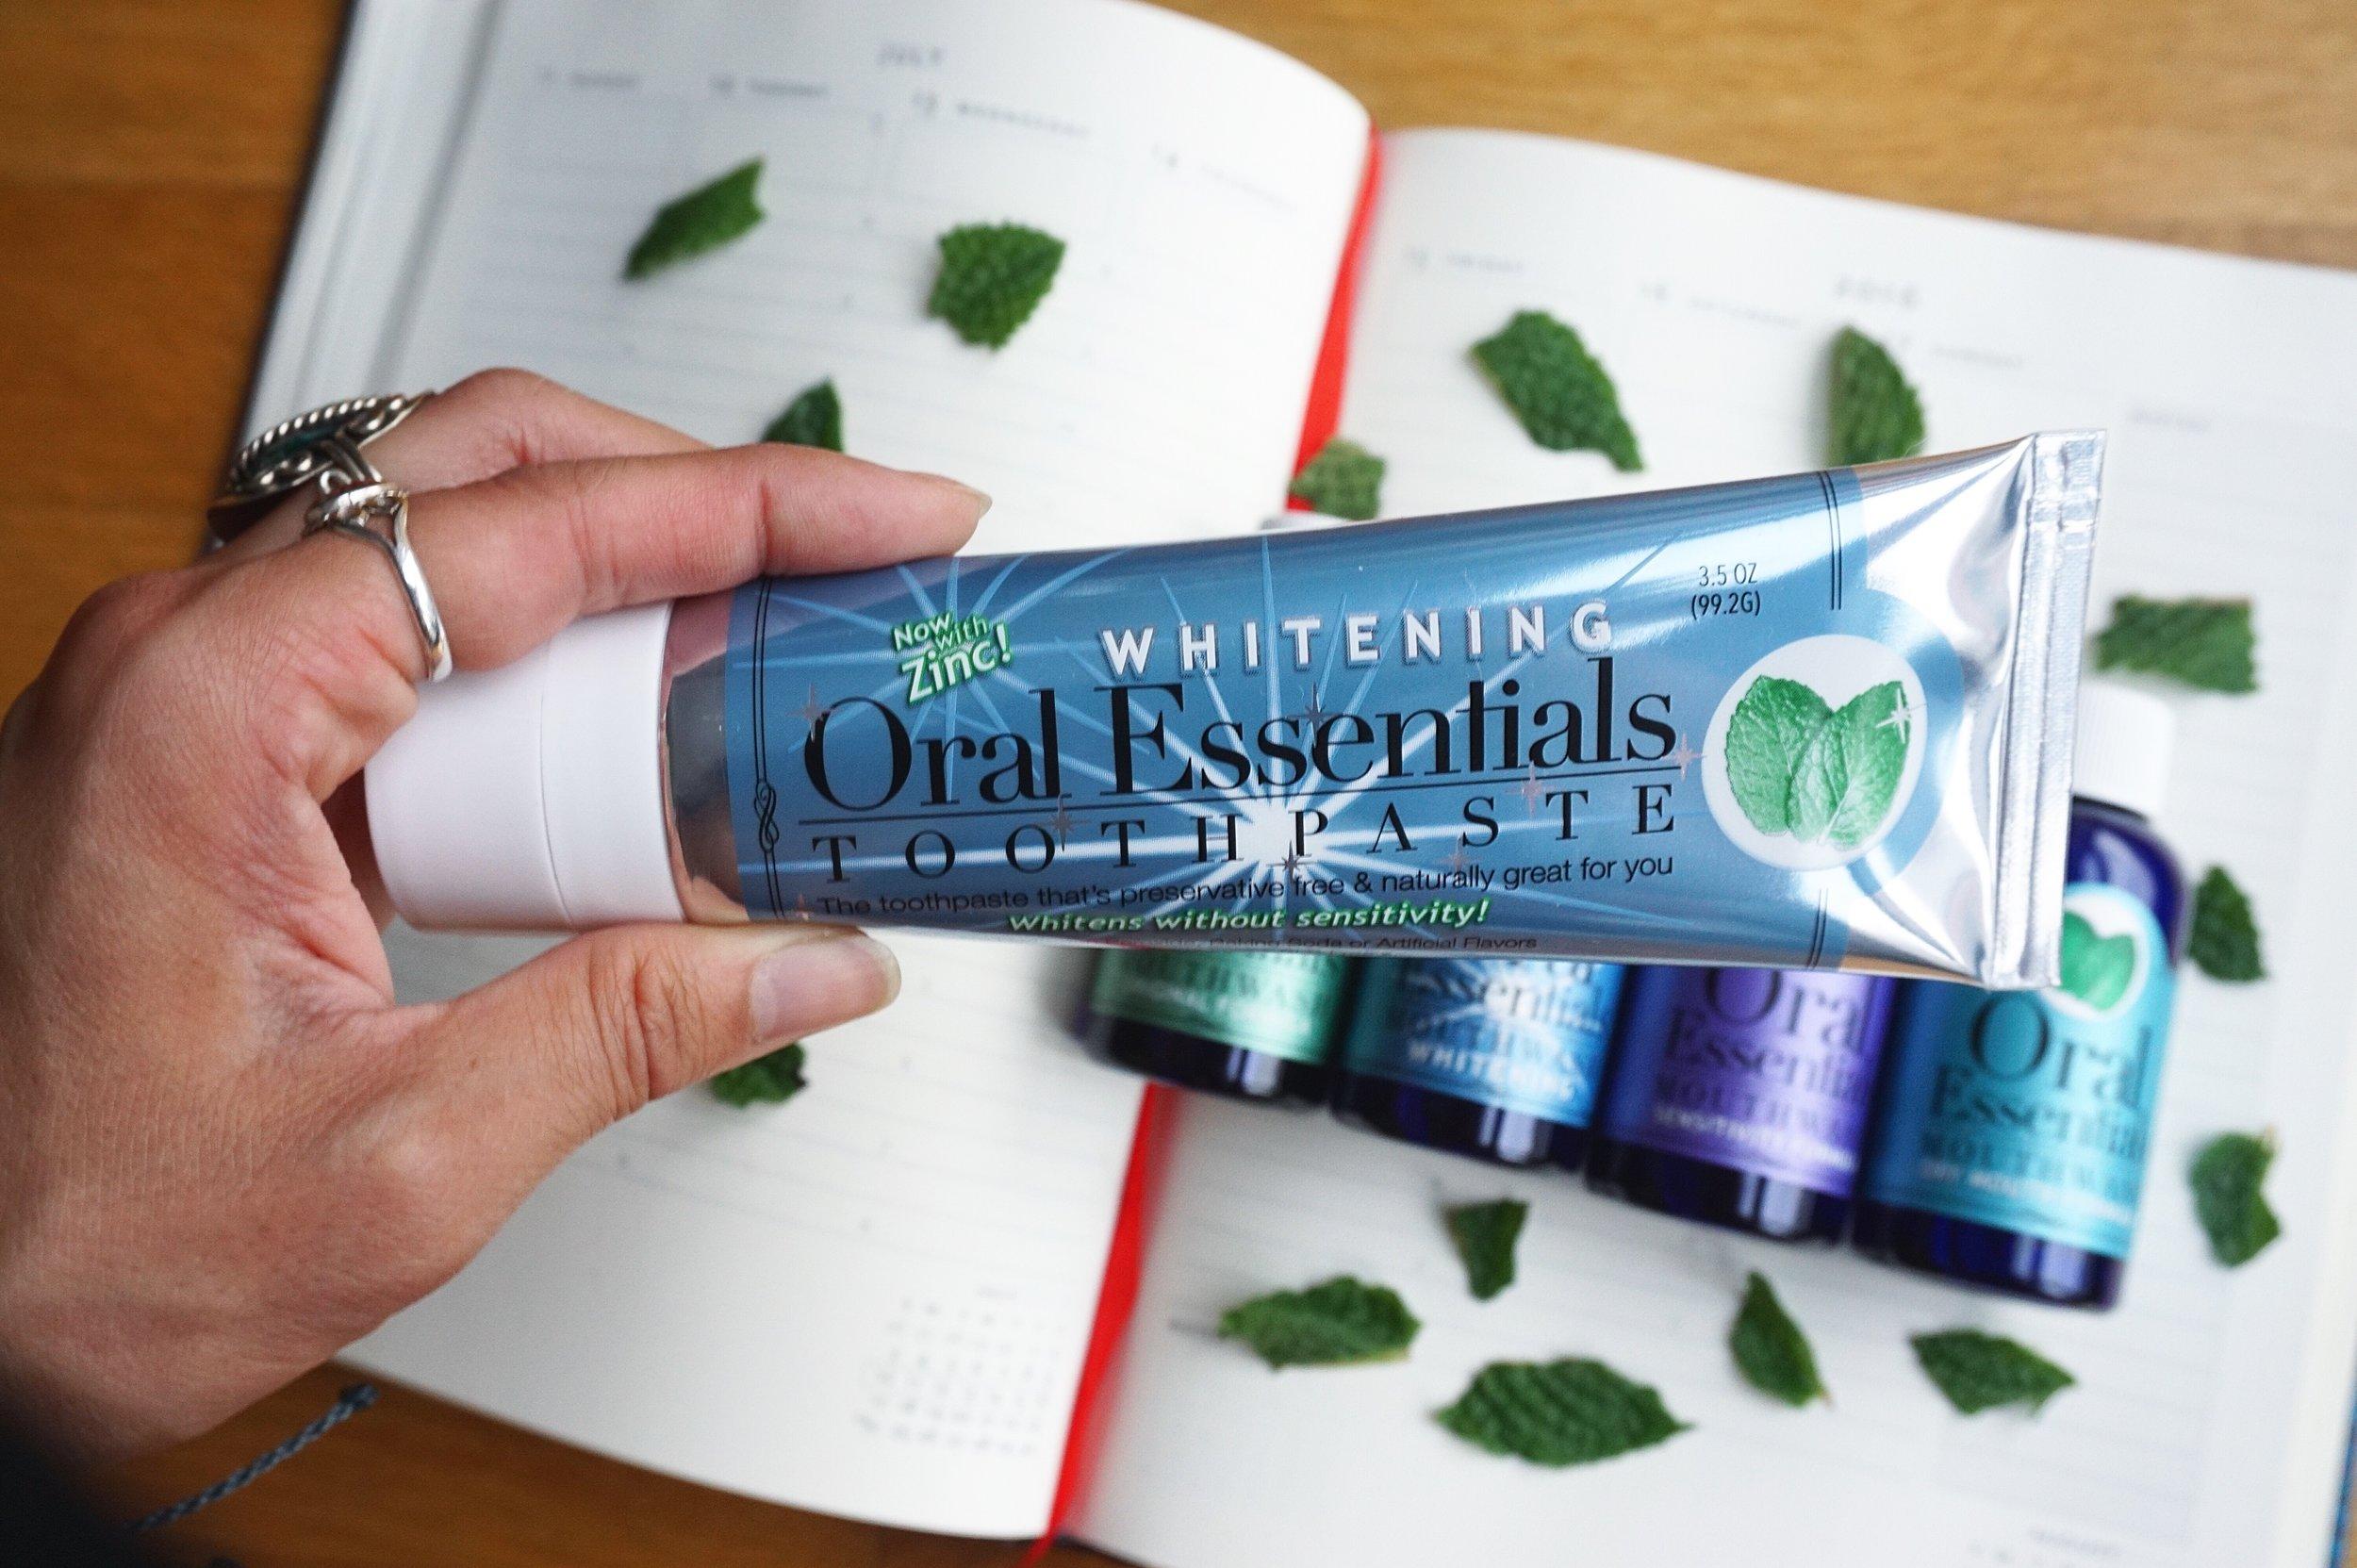 oral essentials toothpaste